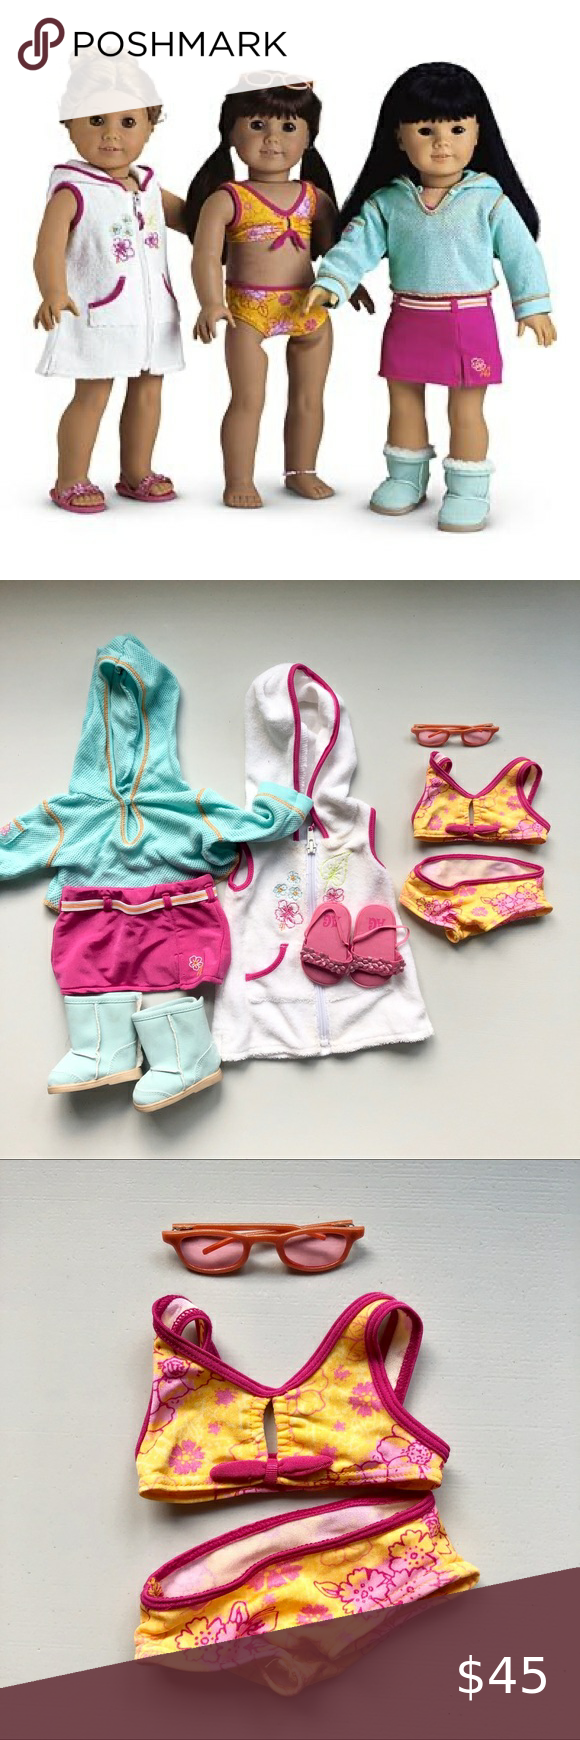 American Girl Seaside Wardrobe Beach Beaded Anklet for Doll Only